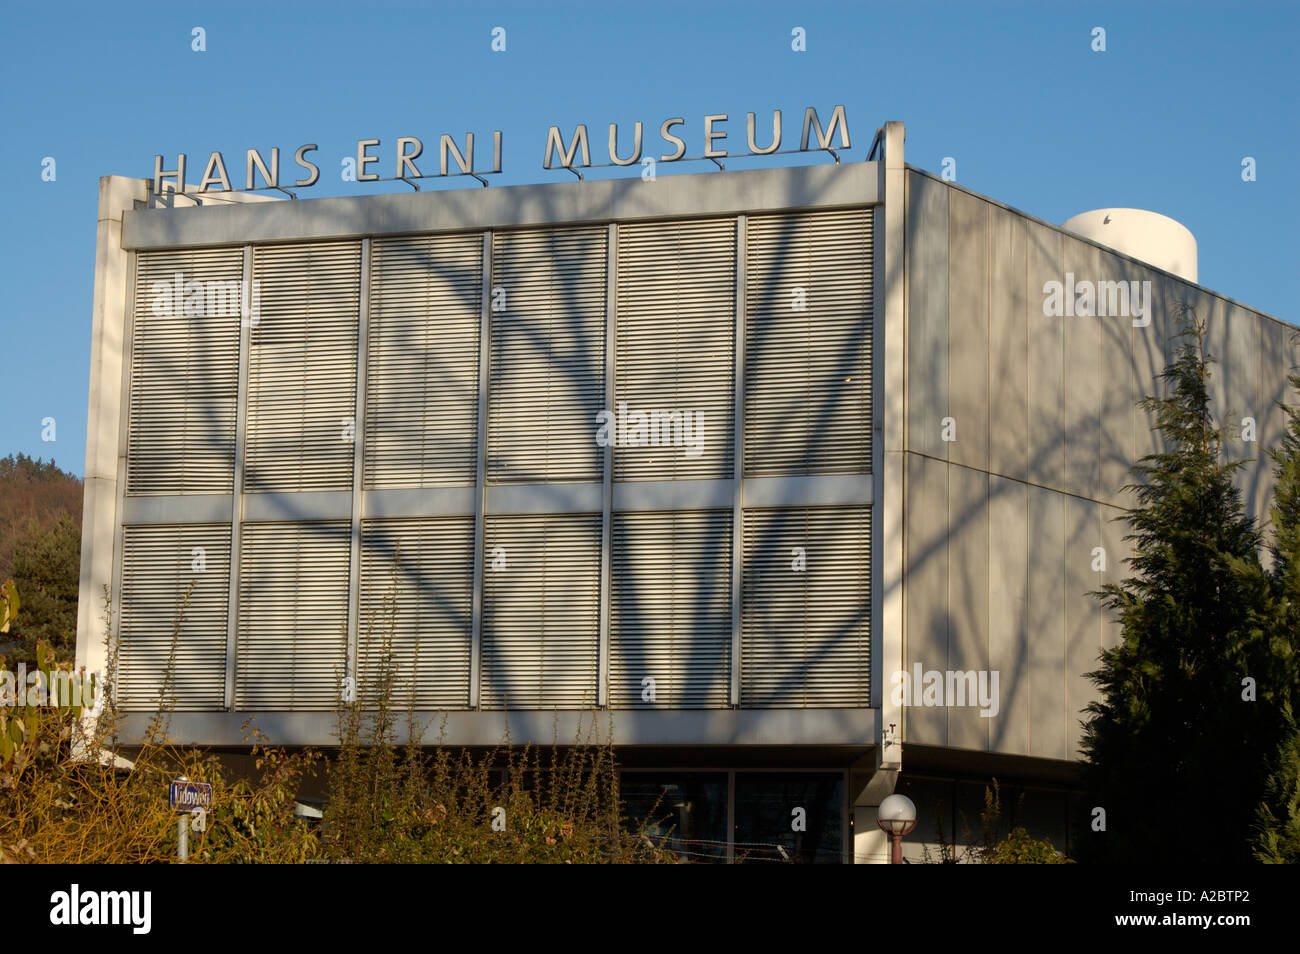 Museo Hans Erni en Lucerna, Suiza. (C) por Uli nusko, CH-3012 Bern Foto de stock